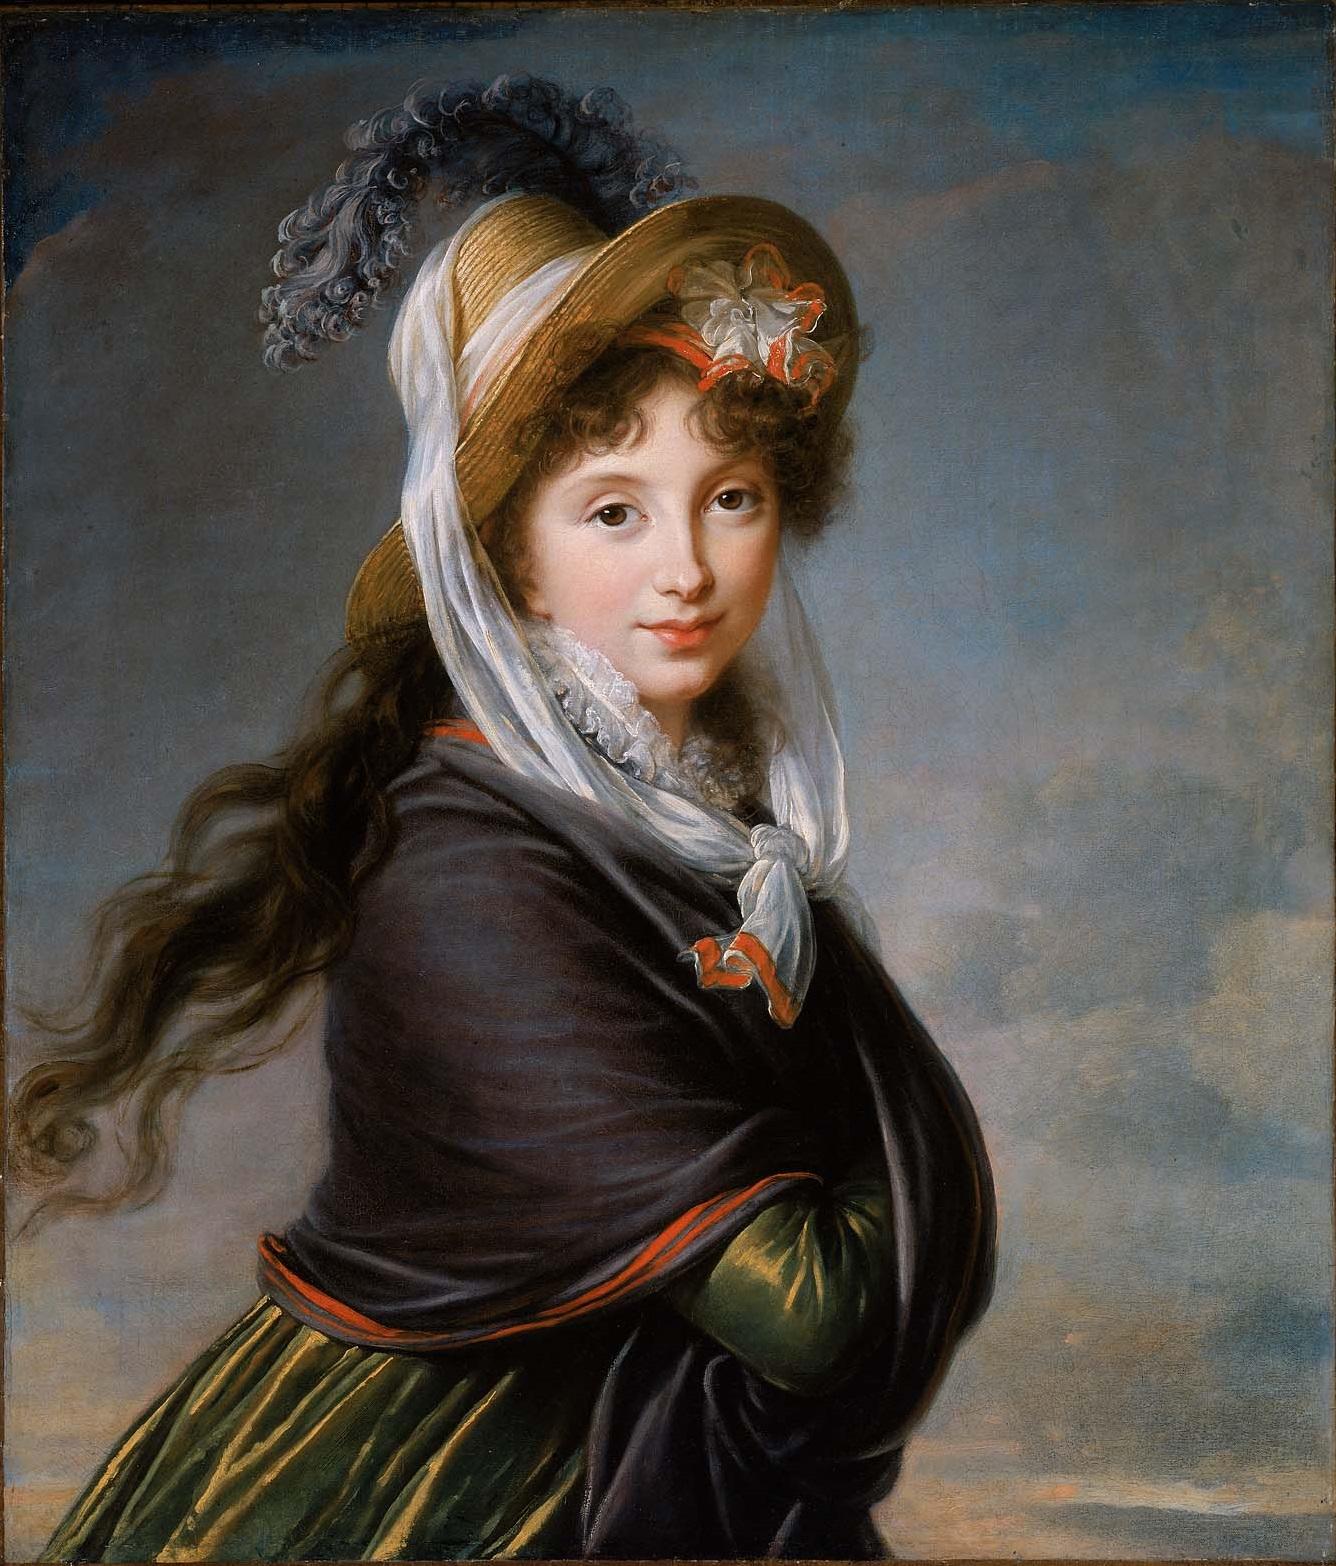 49dfadde02d8 1795–1820 in Western fashion - Wikipedia